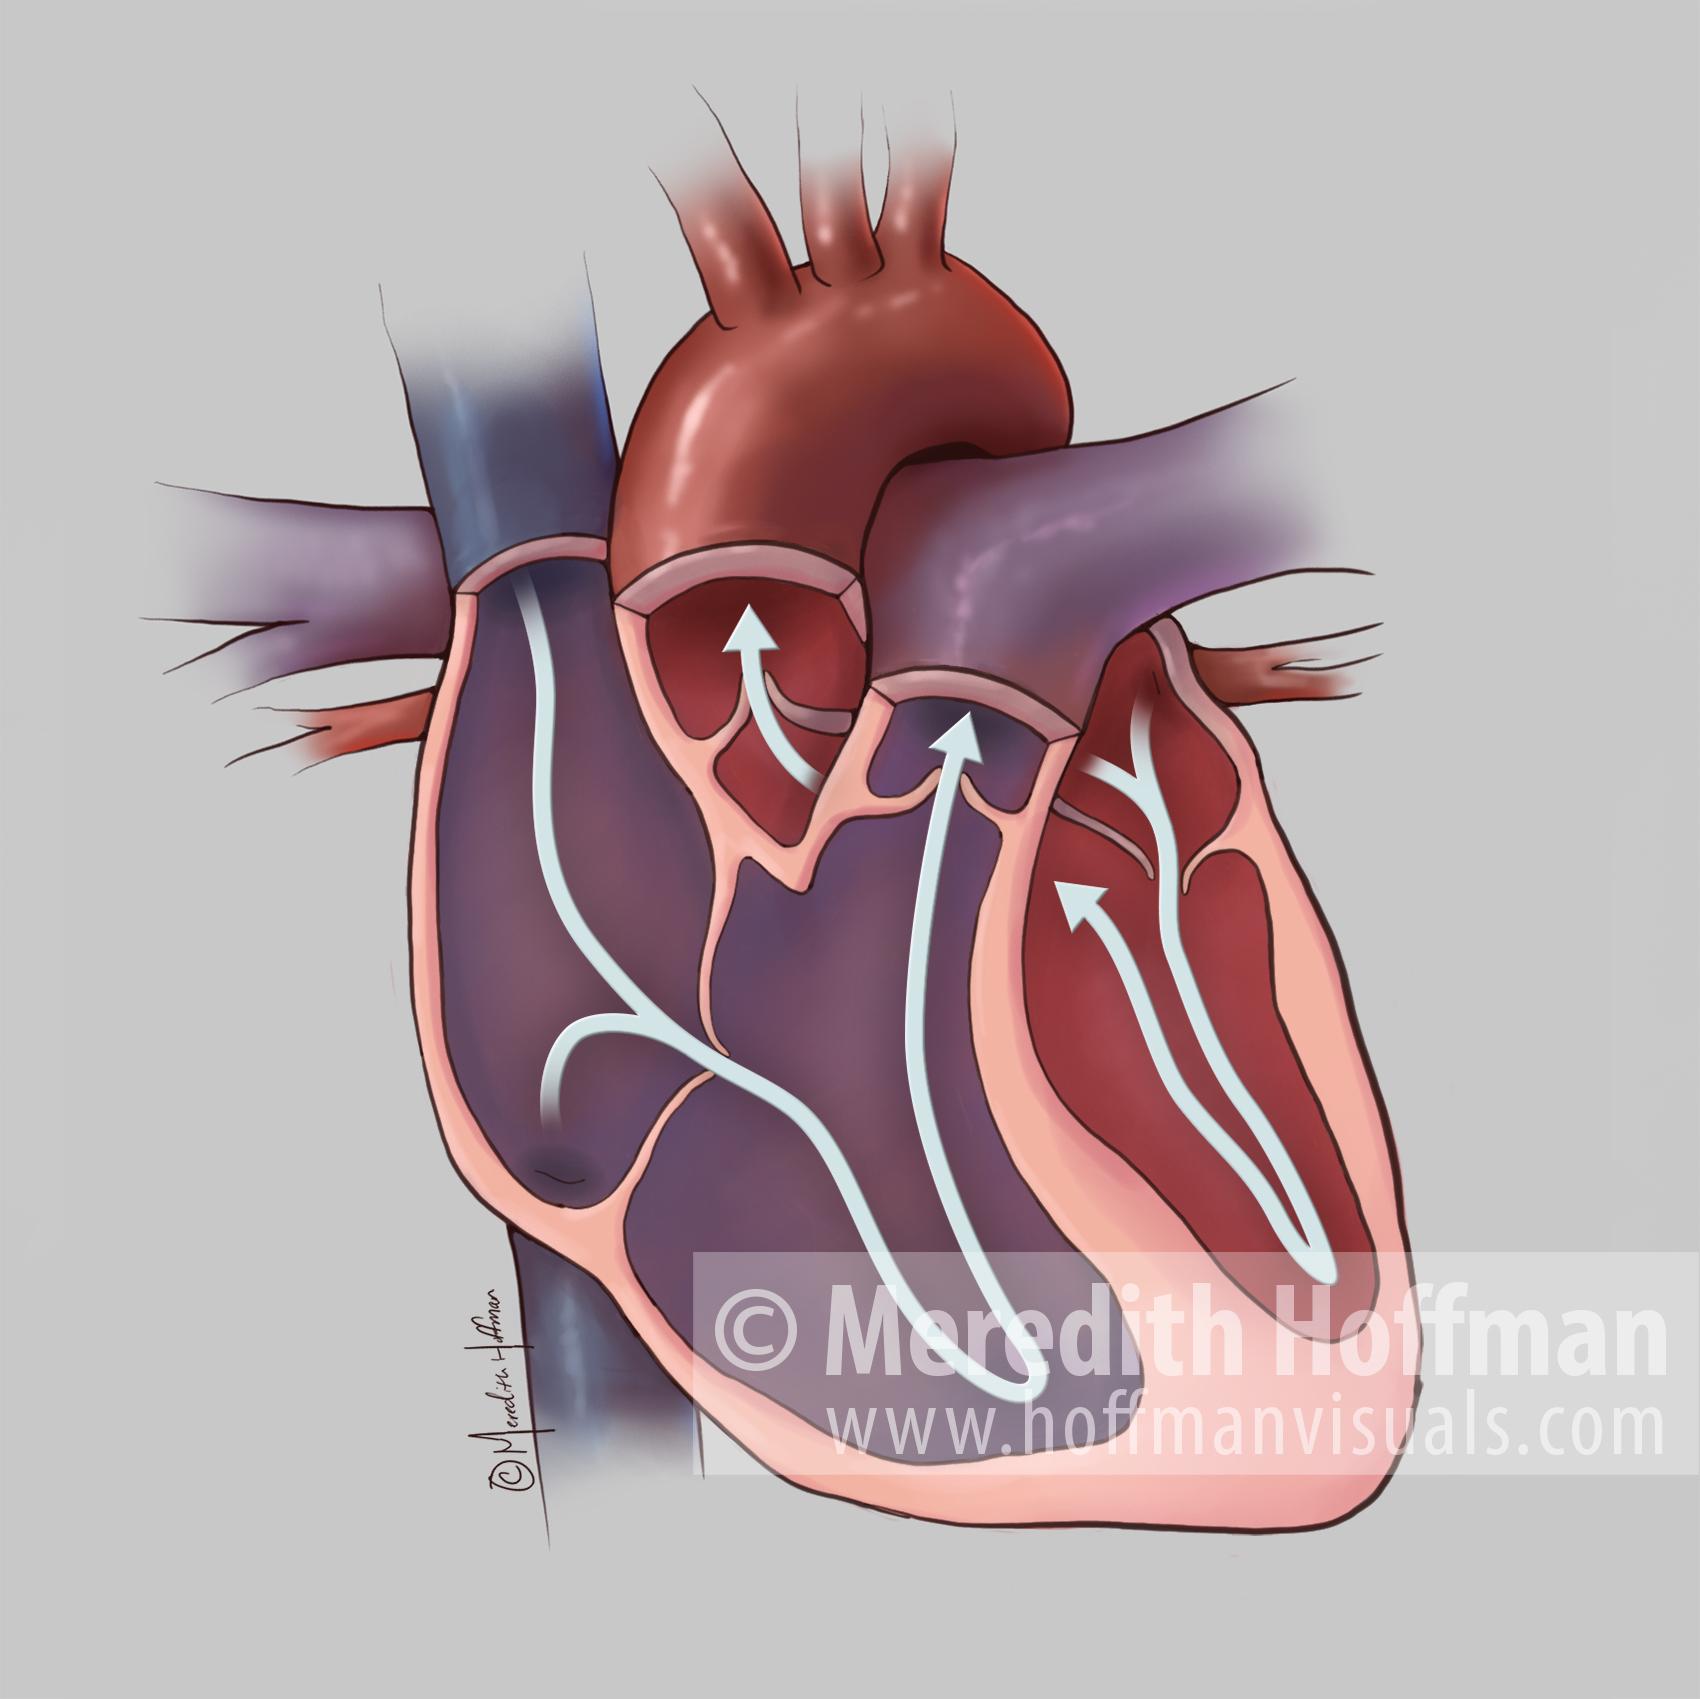 Blood flow through the heart